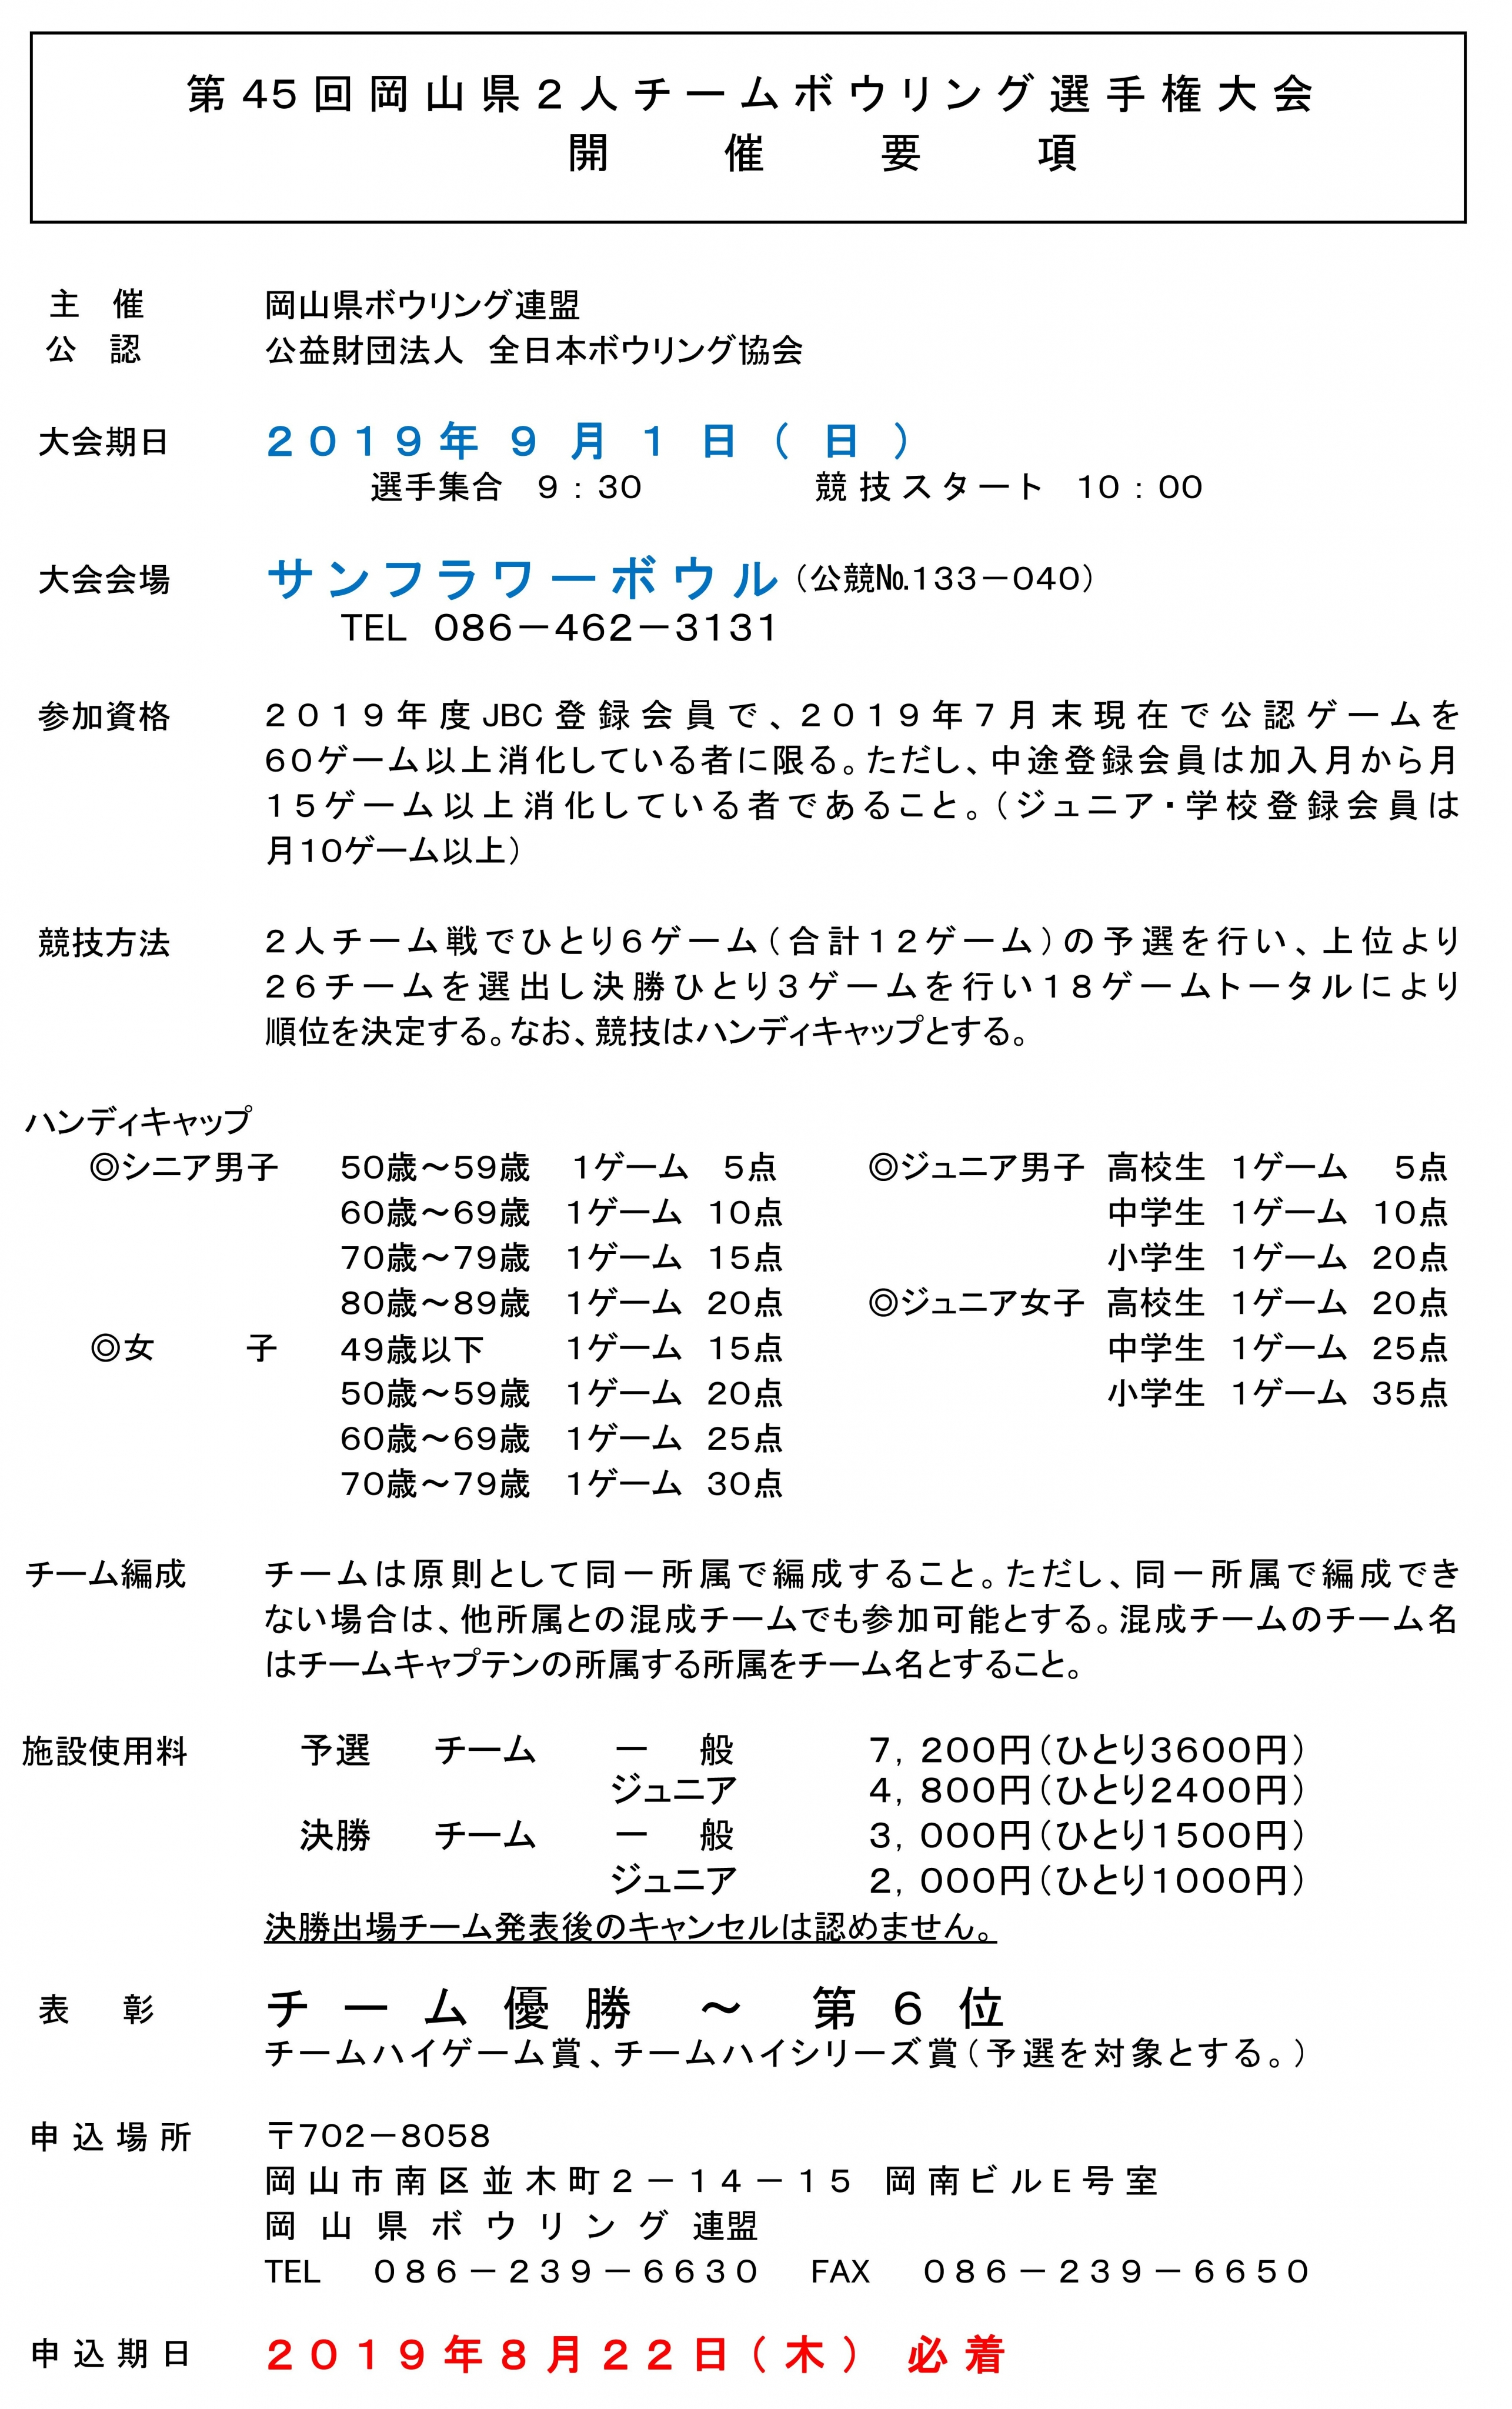 14.2人チーム選手権大会.jpg